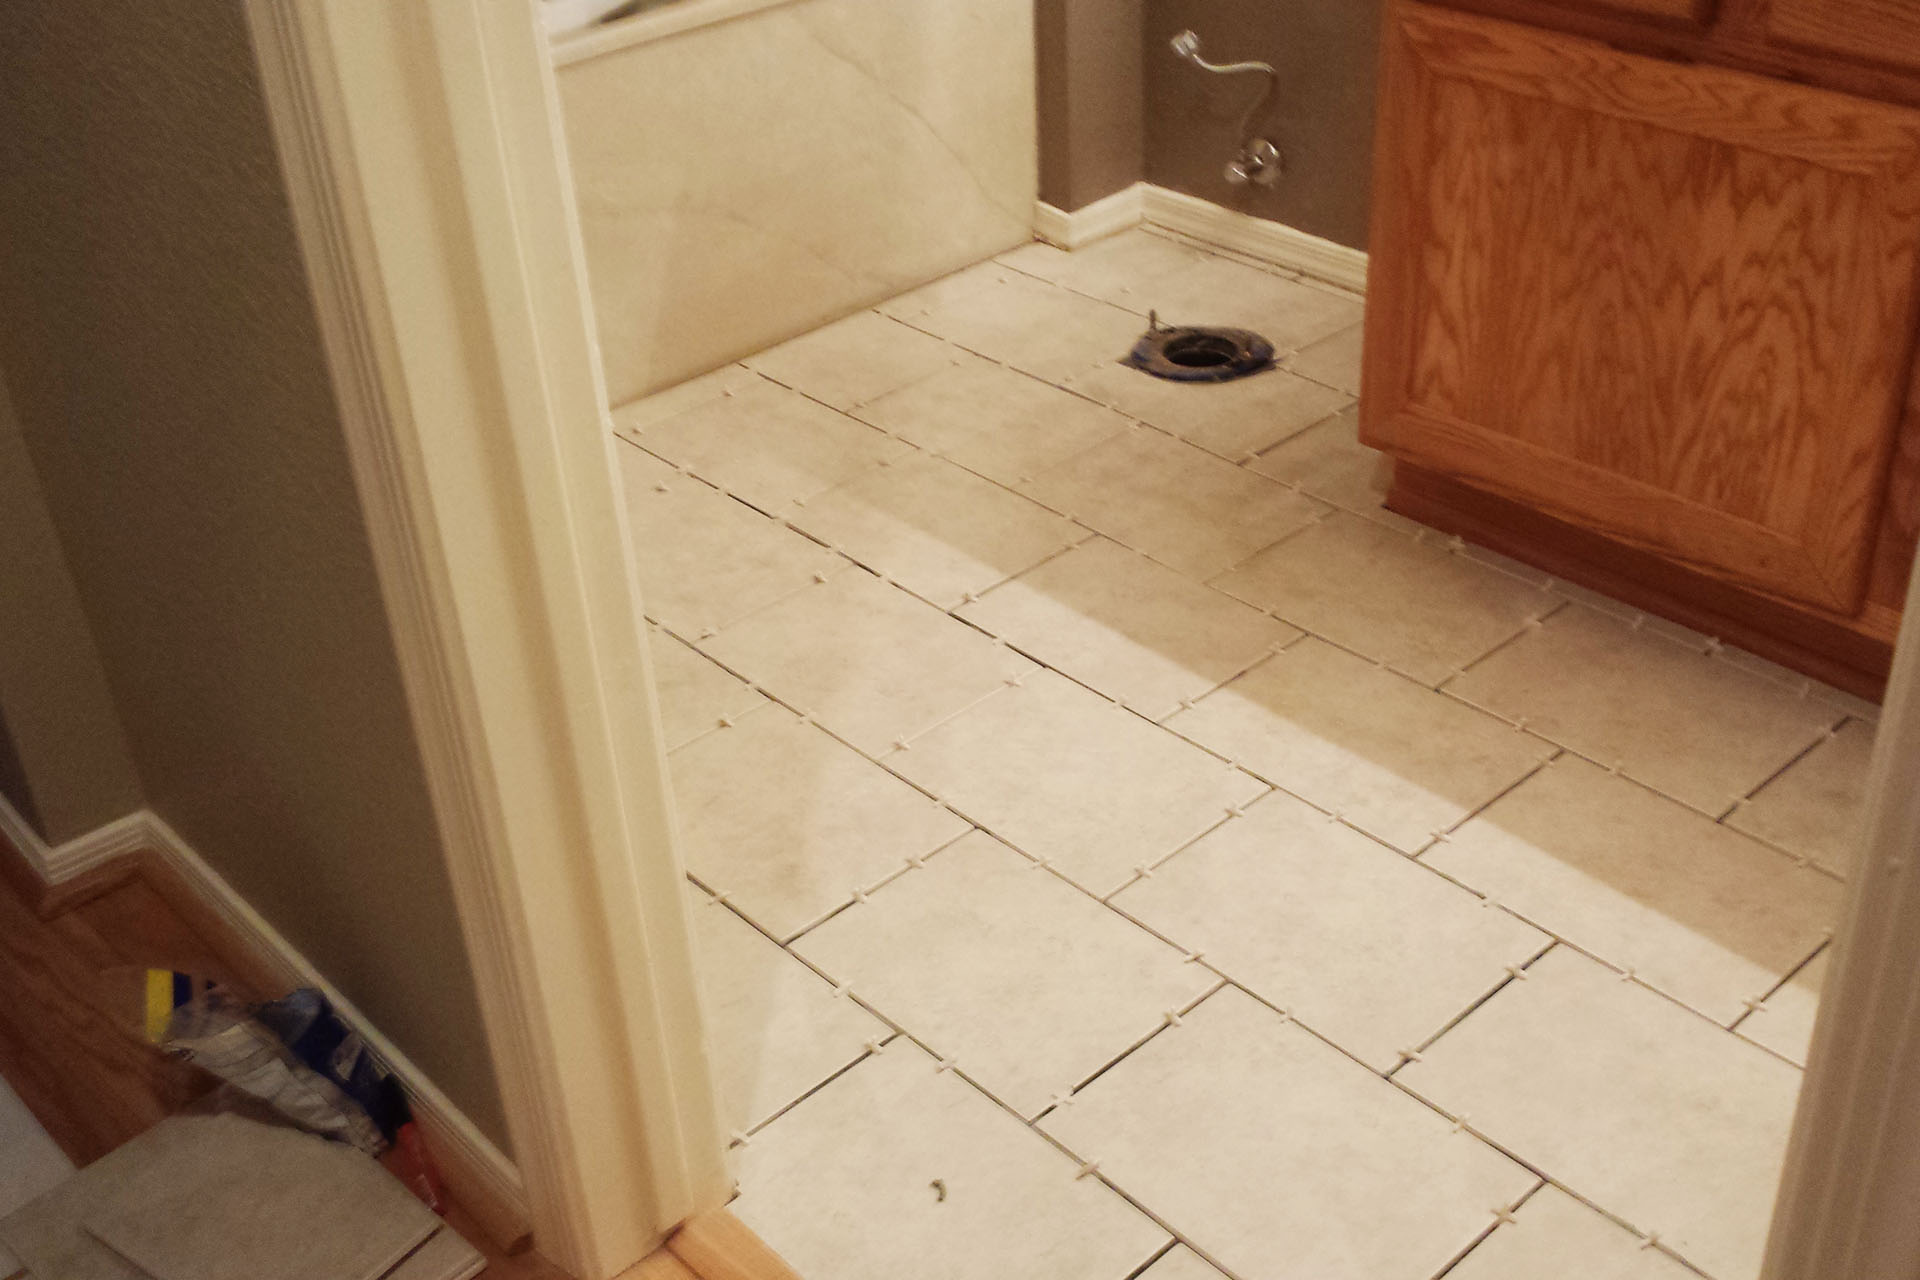 View Bathroom Tile Installation